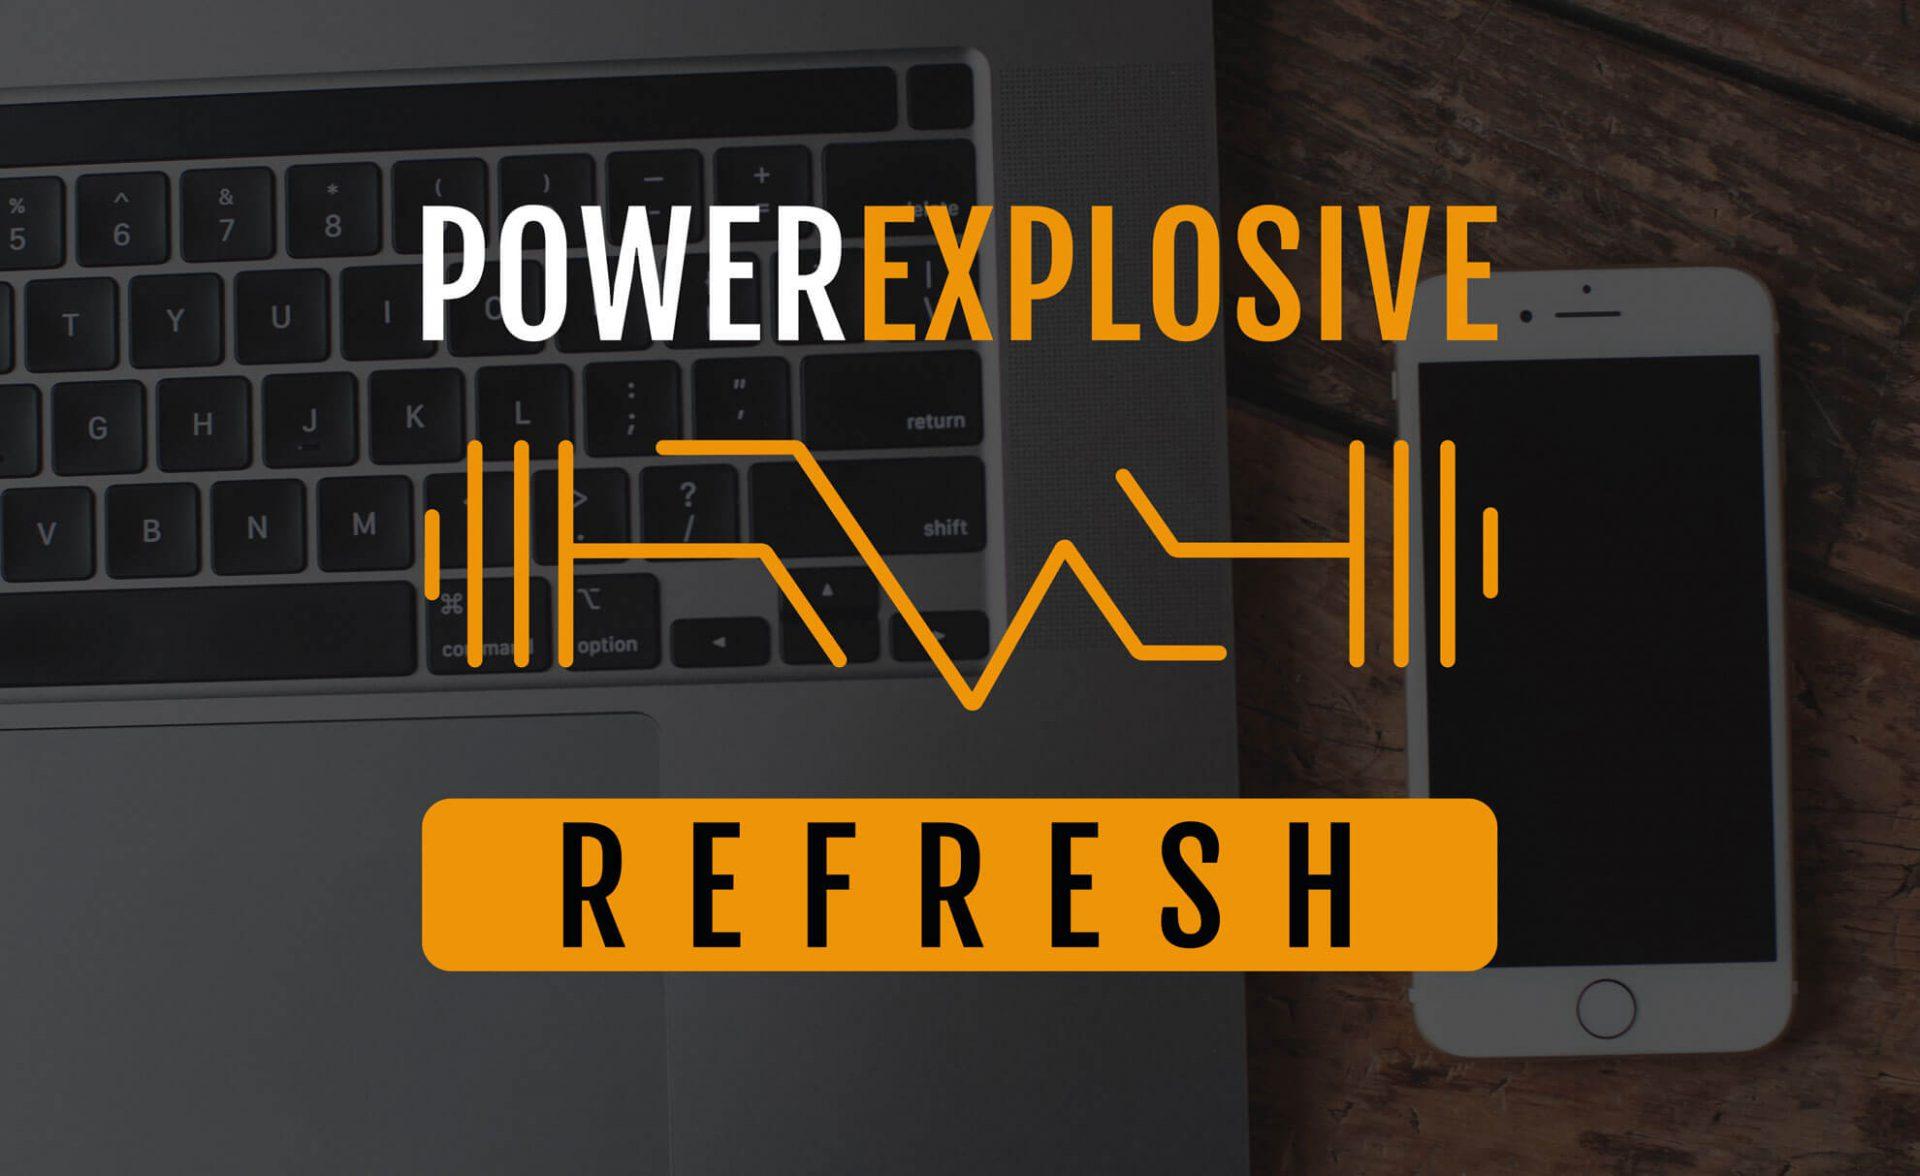 imagen corporativa portfolio diseño power explosive refresh